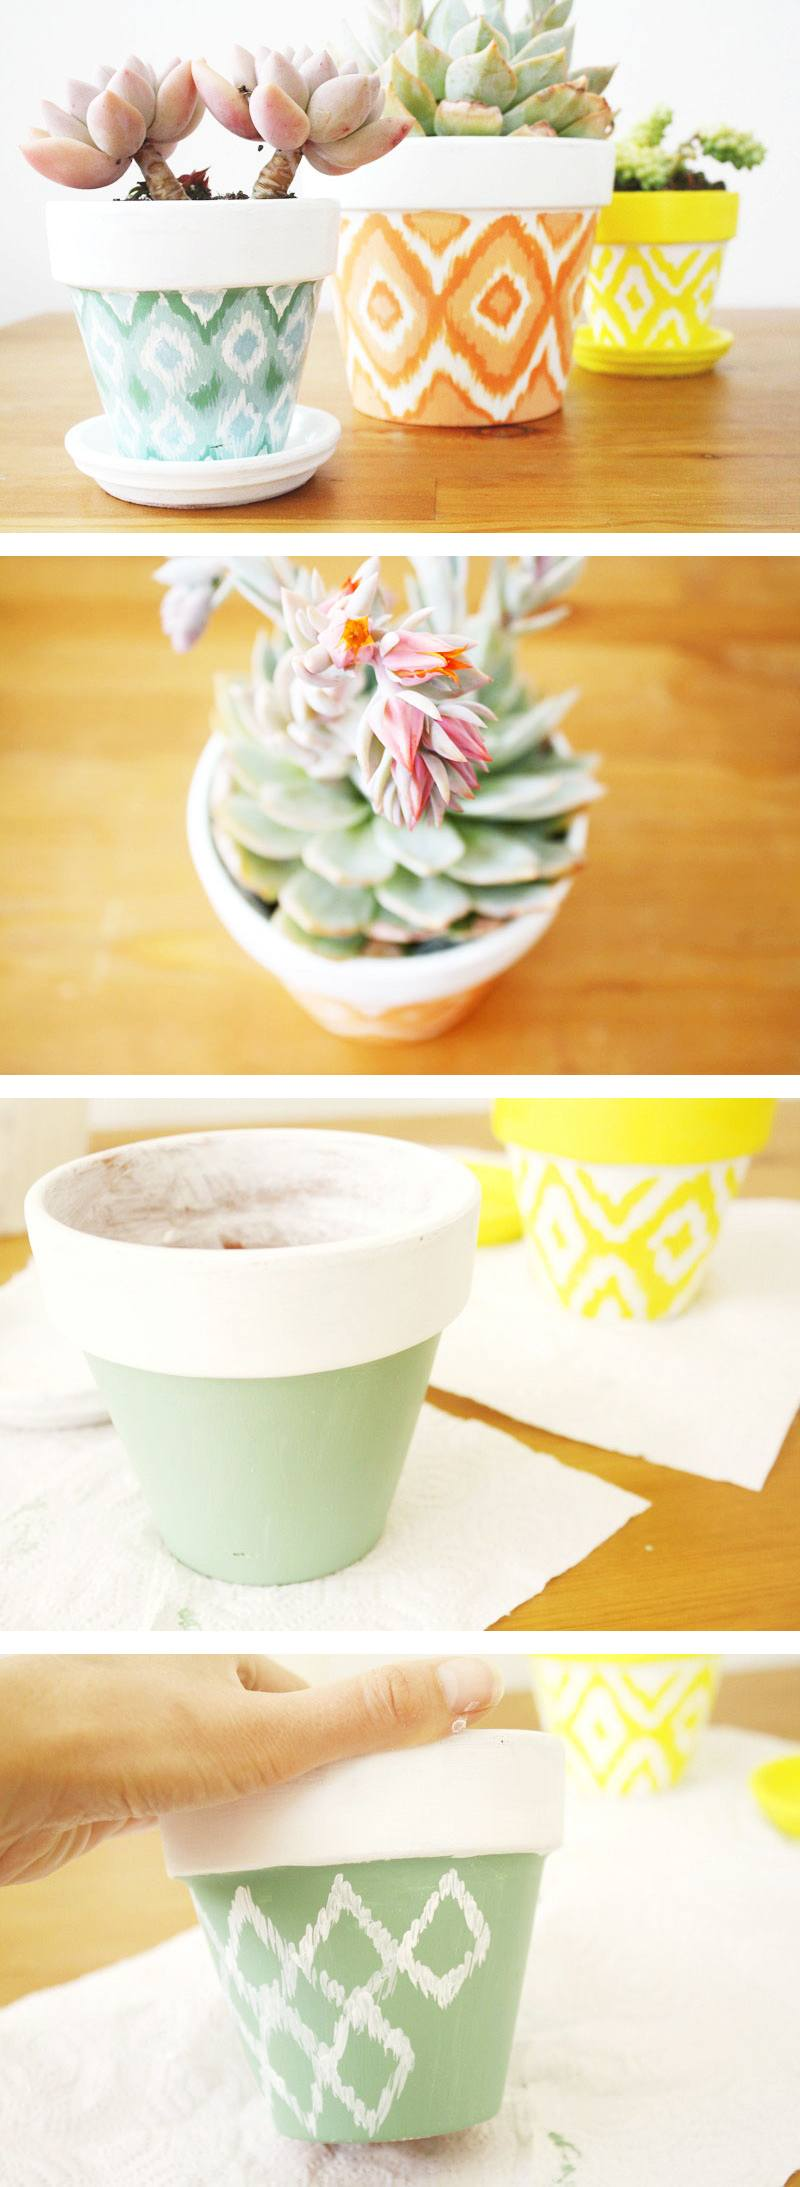 25 Simple Diy Ways To Customize Paint Terra Cotta Pots Homelovr